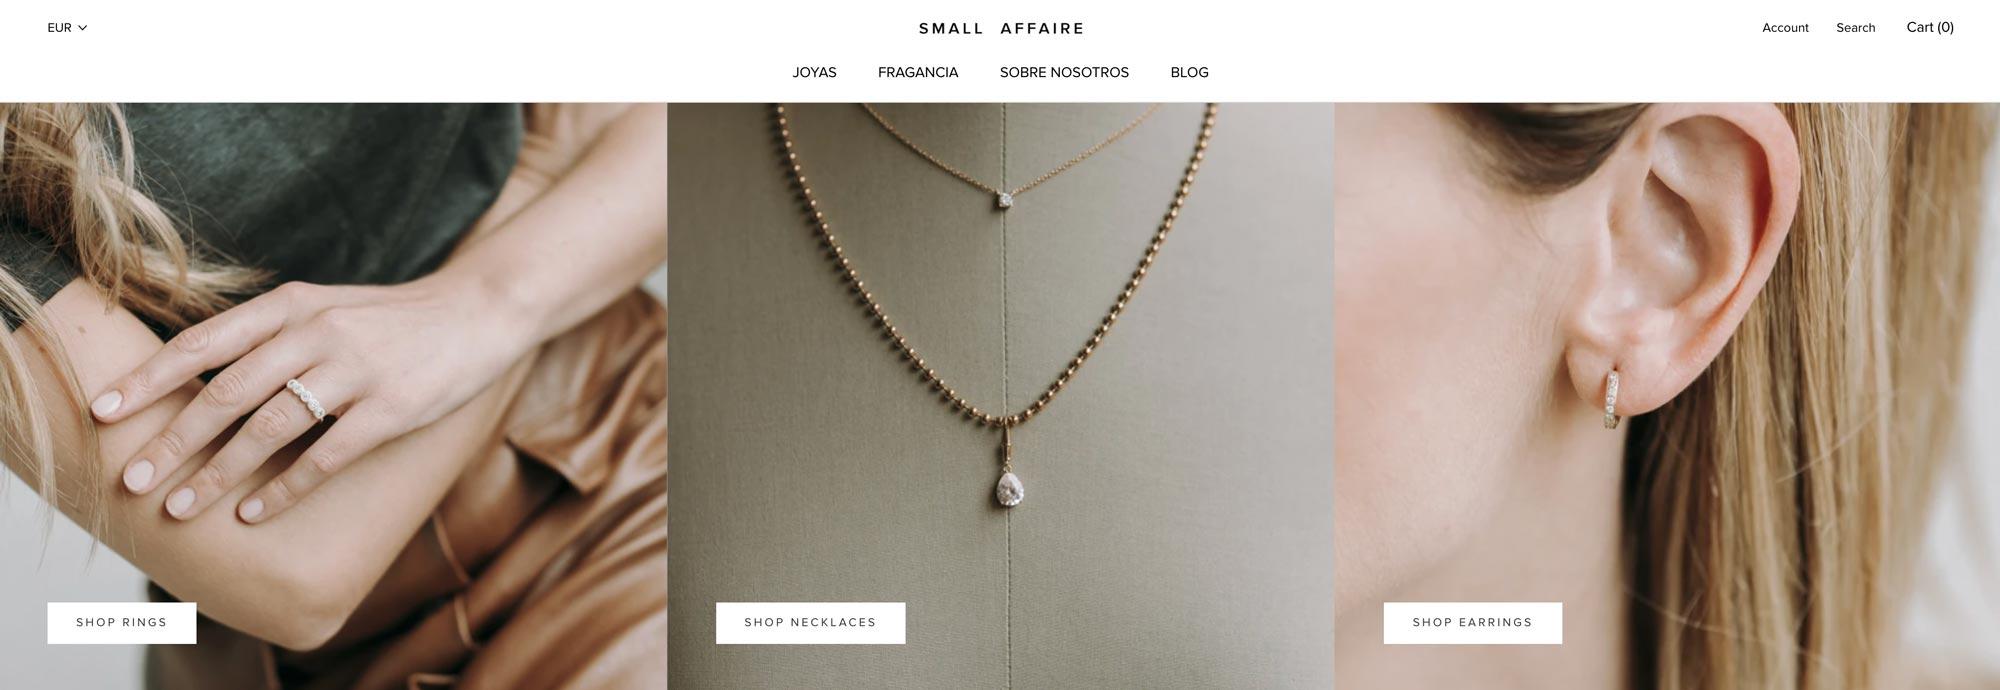 Shopify Small Affair